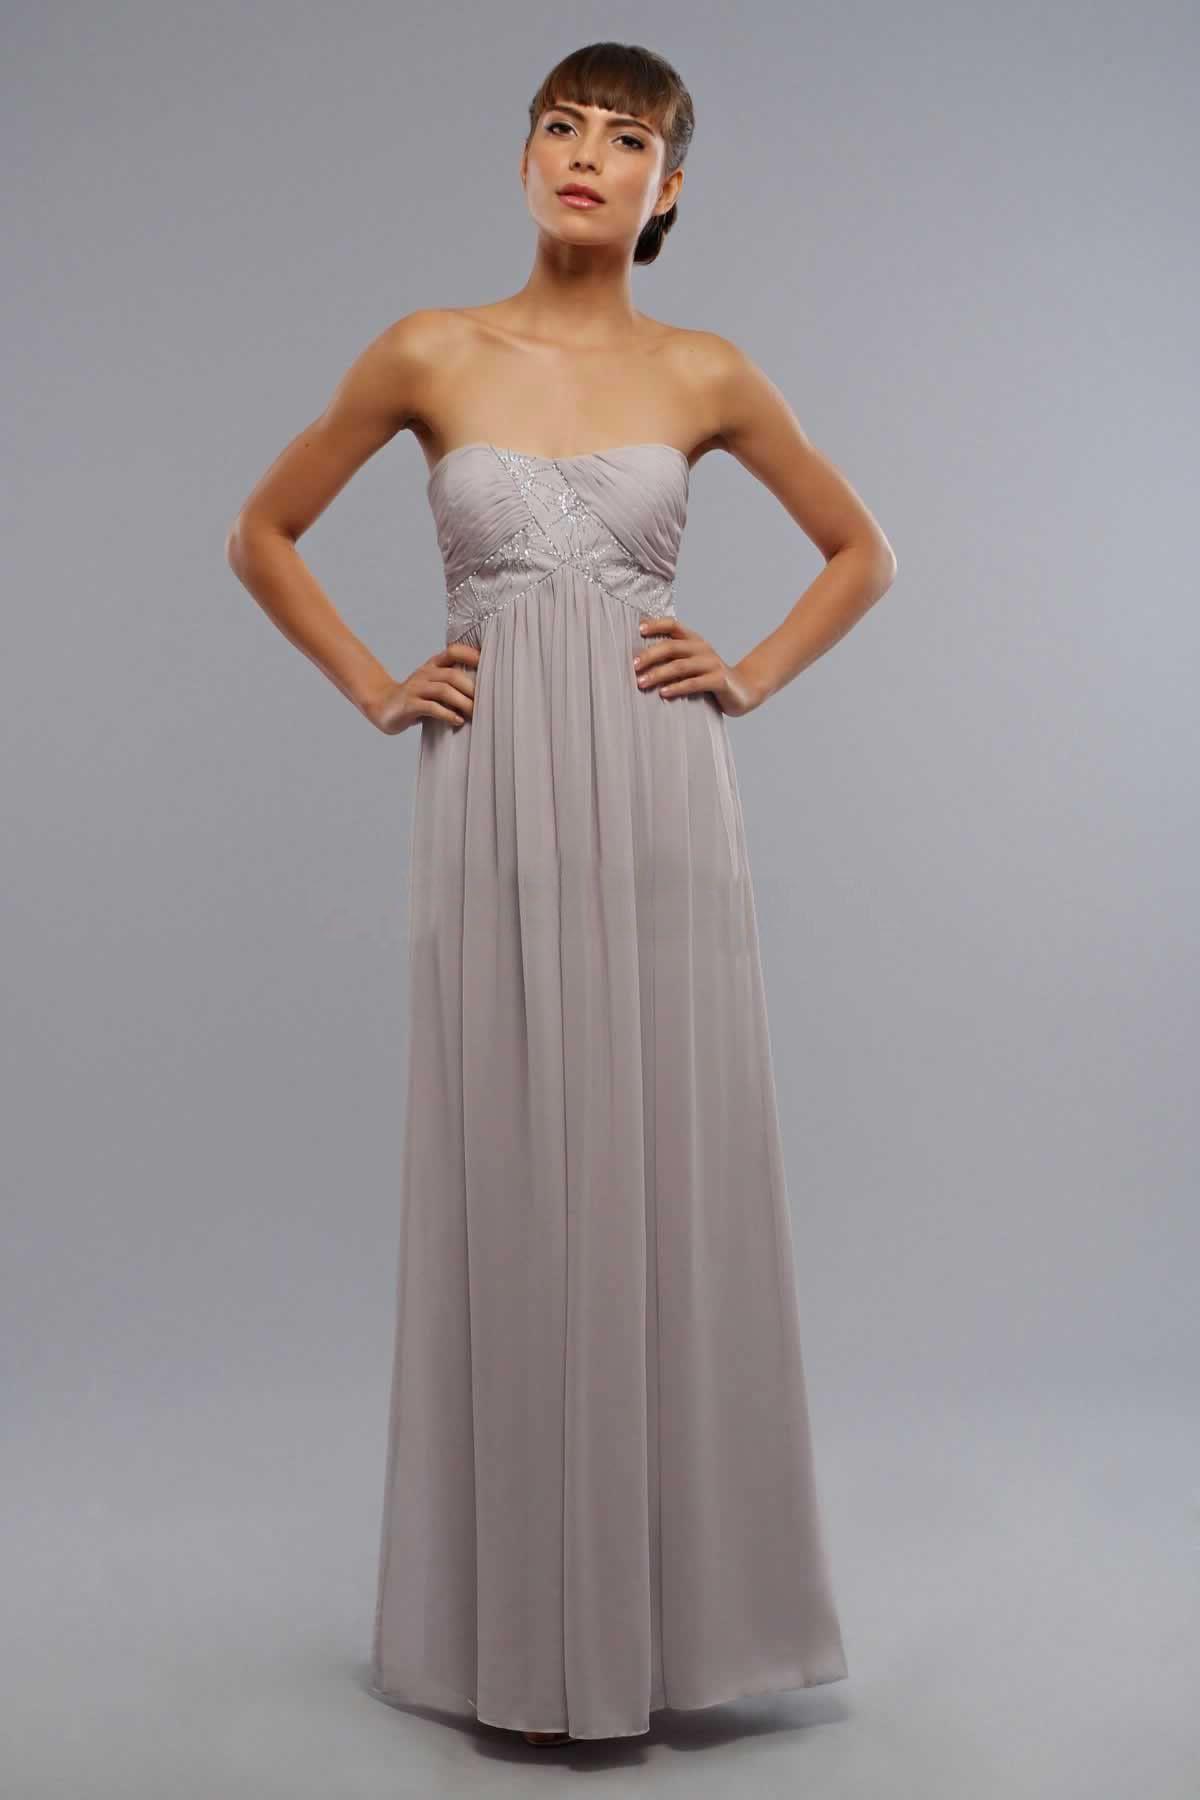 Pin By Liz Fields On Wedding Bridesmaid Dresses Pinterest